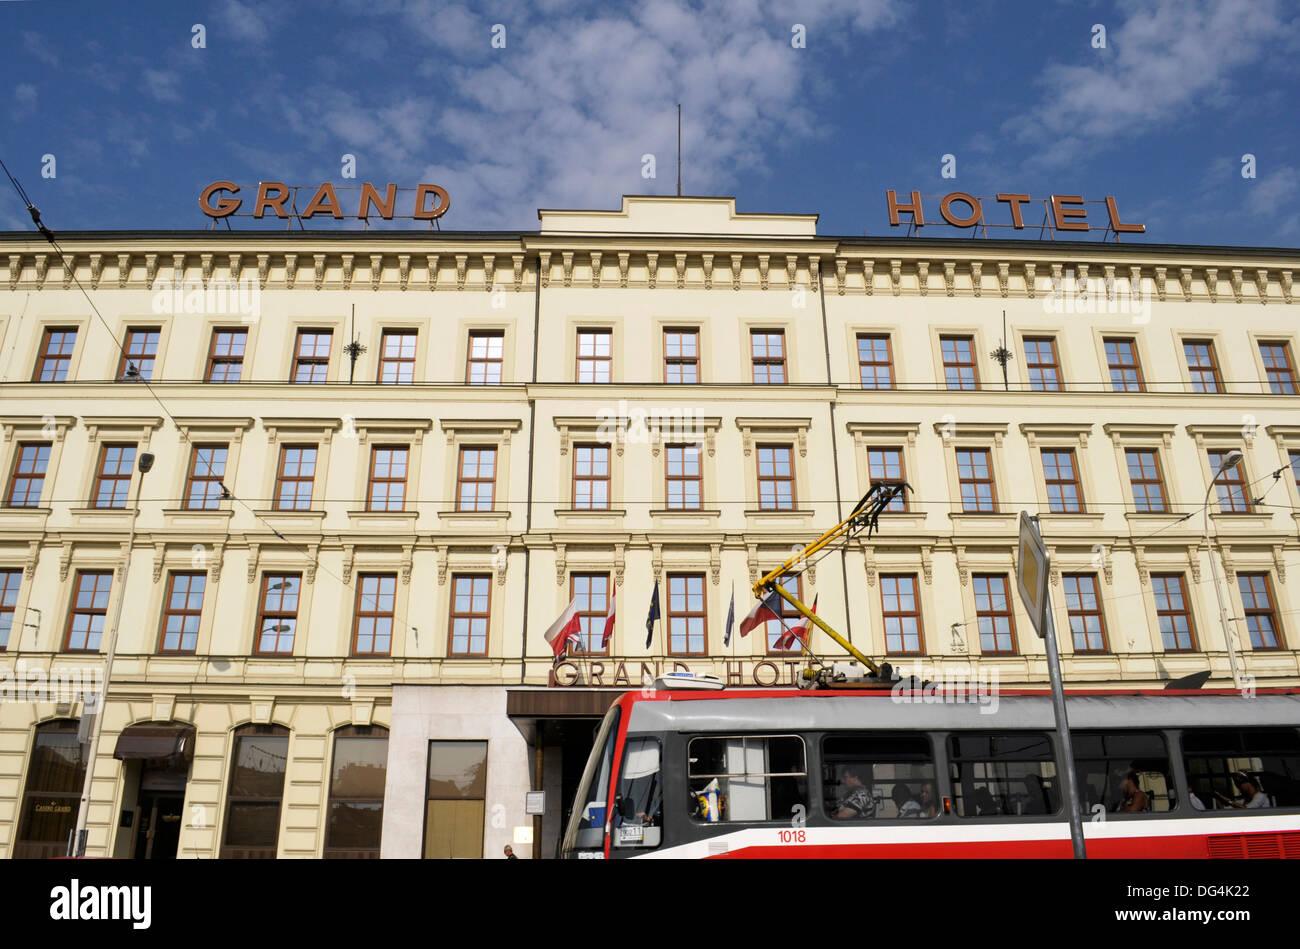 Tram and Grand Hotel Brno, Benesova, Brno, Czech Republic - Stock Image